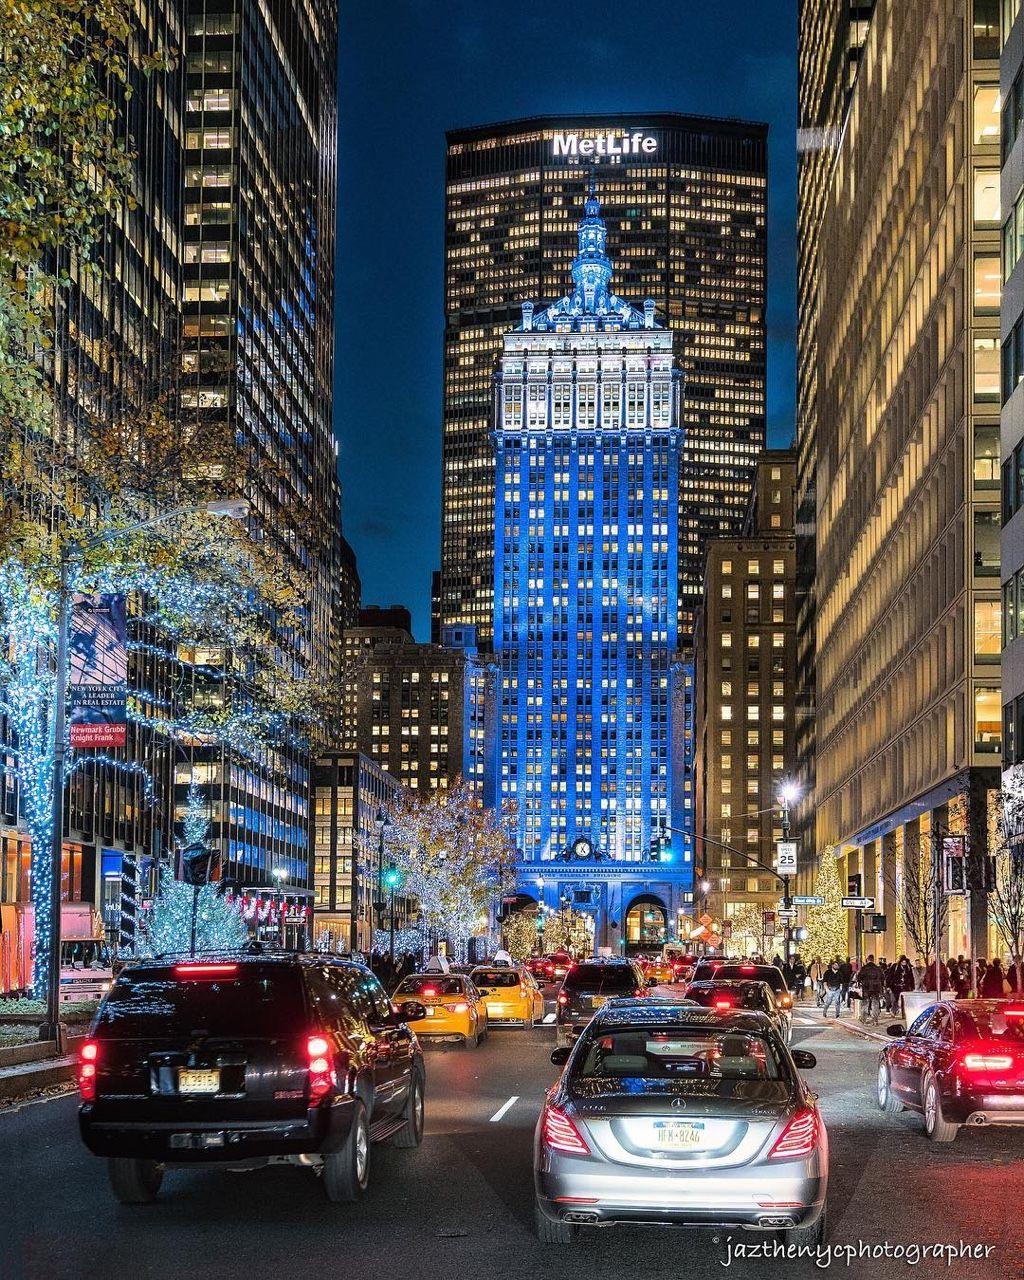 Manhattan To New York City: Park Avenue, Manhattan, NYC By Jazthenycphotographer